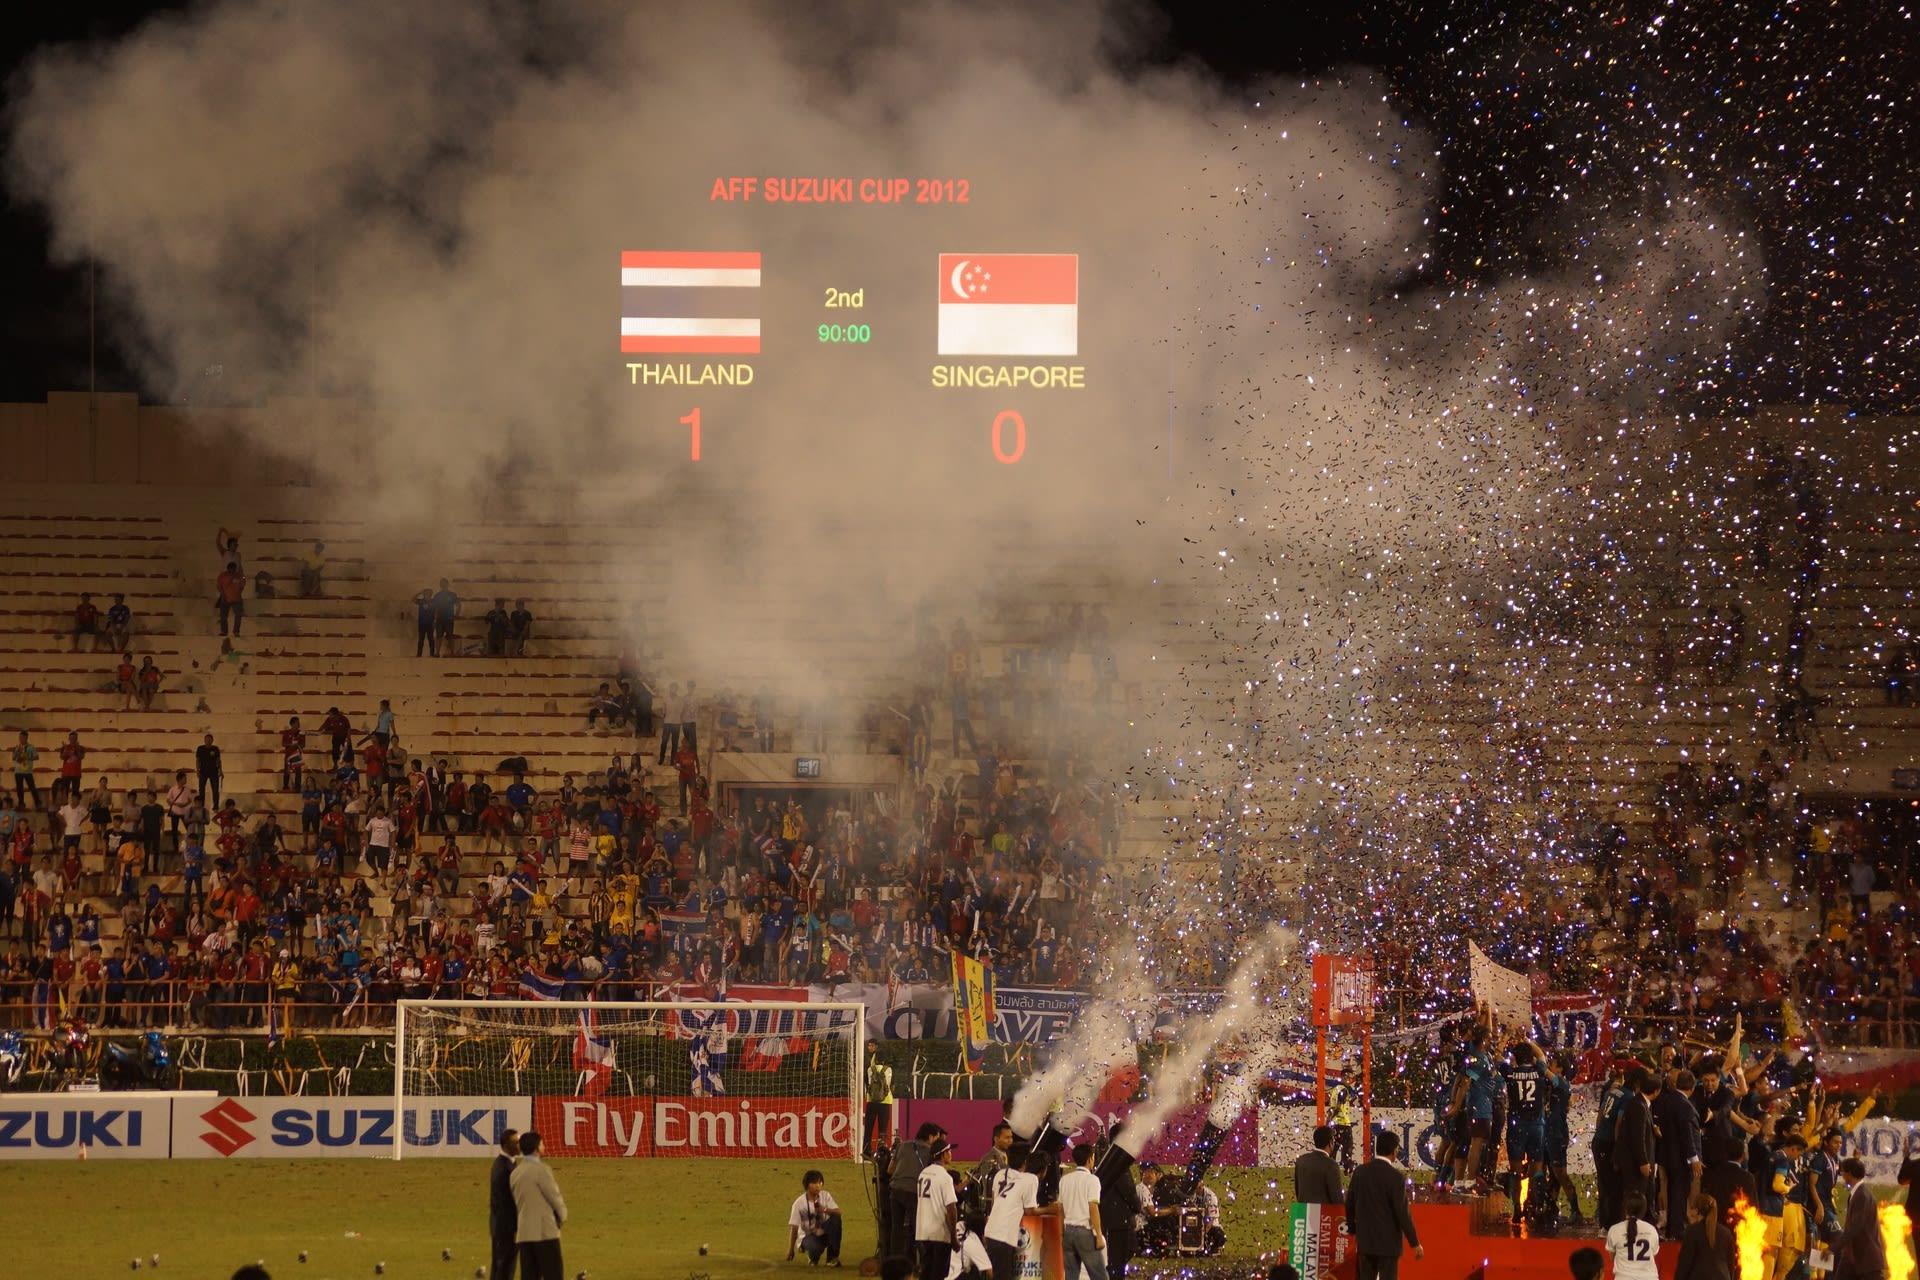 AFFスズキカップ2012」のブログ...